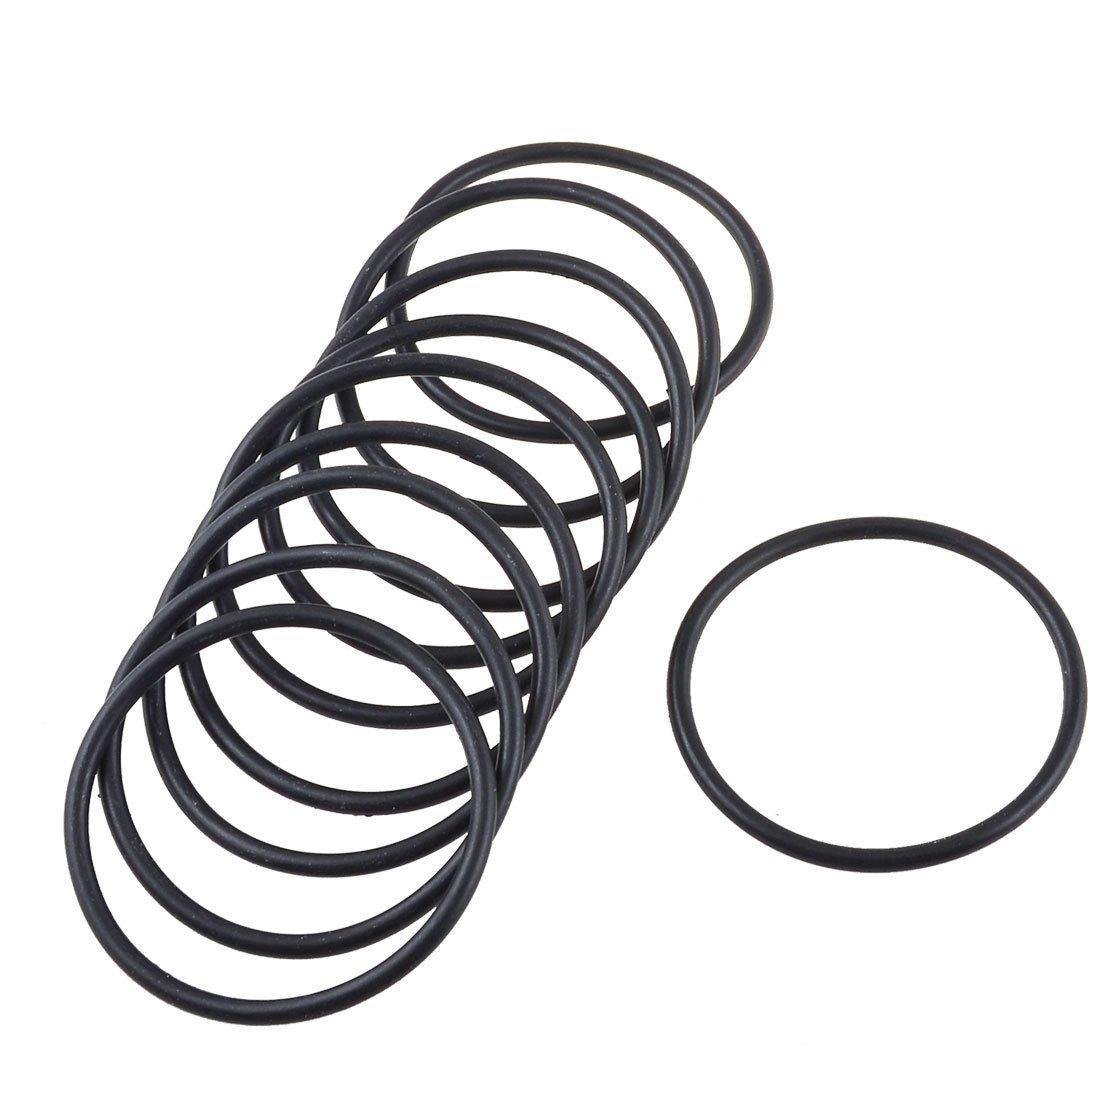 10 Pcs 53mm x 3mm Black Rubber Oil Seal O Ring Sealing Gasket Washers